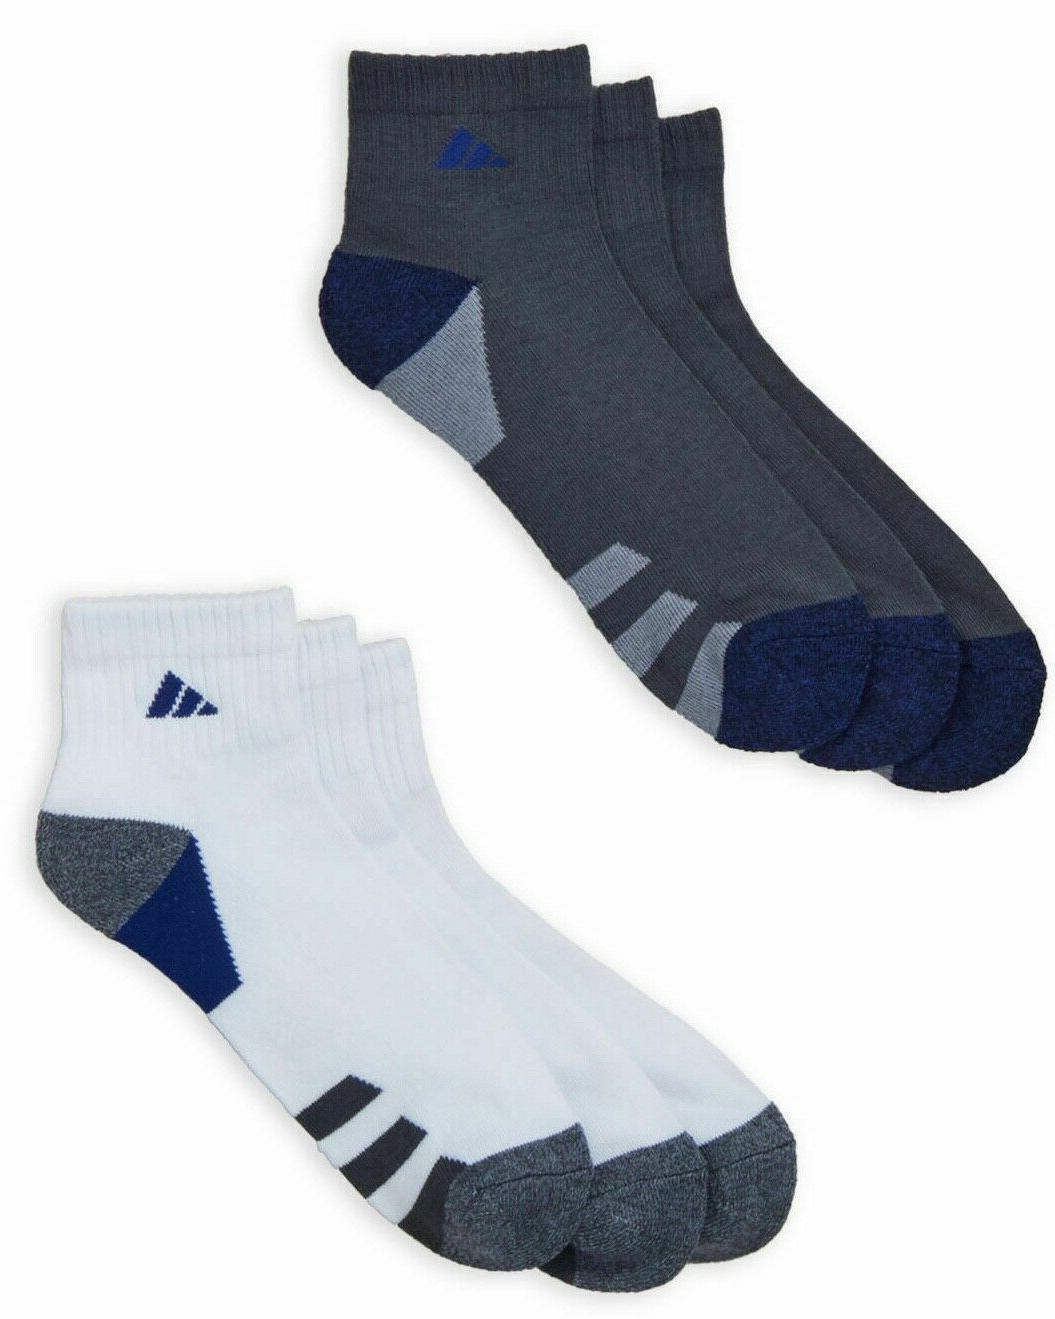 6 Adidas Cushion QUARTER Socks WHITE WICKING